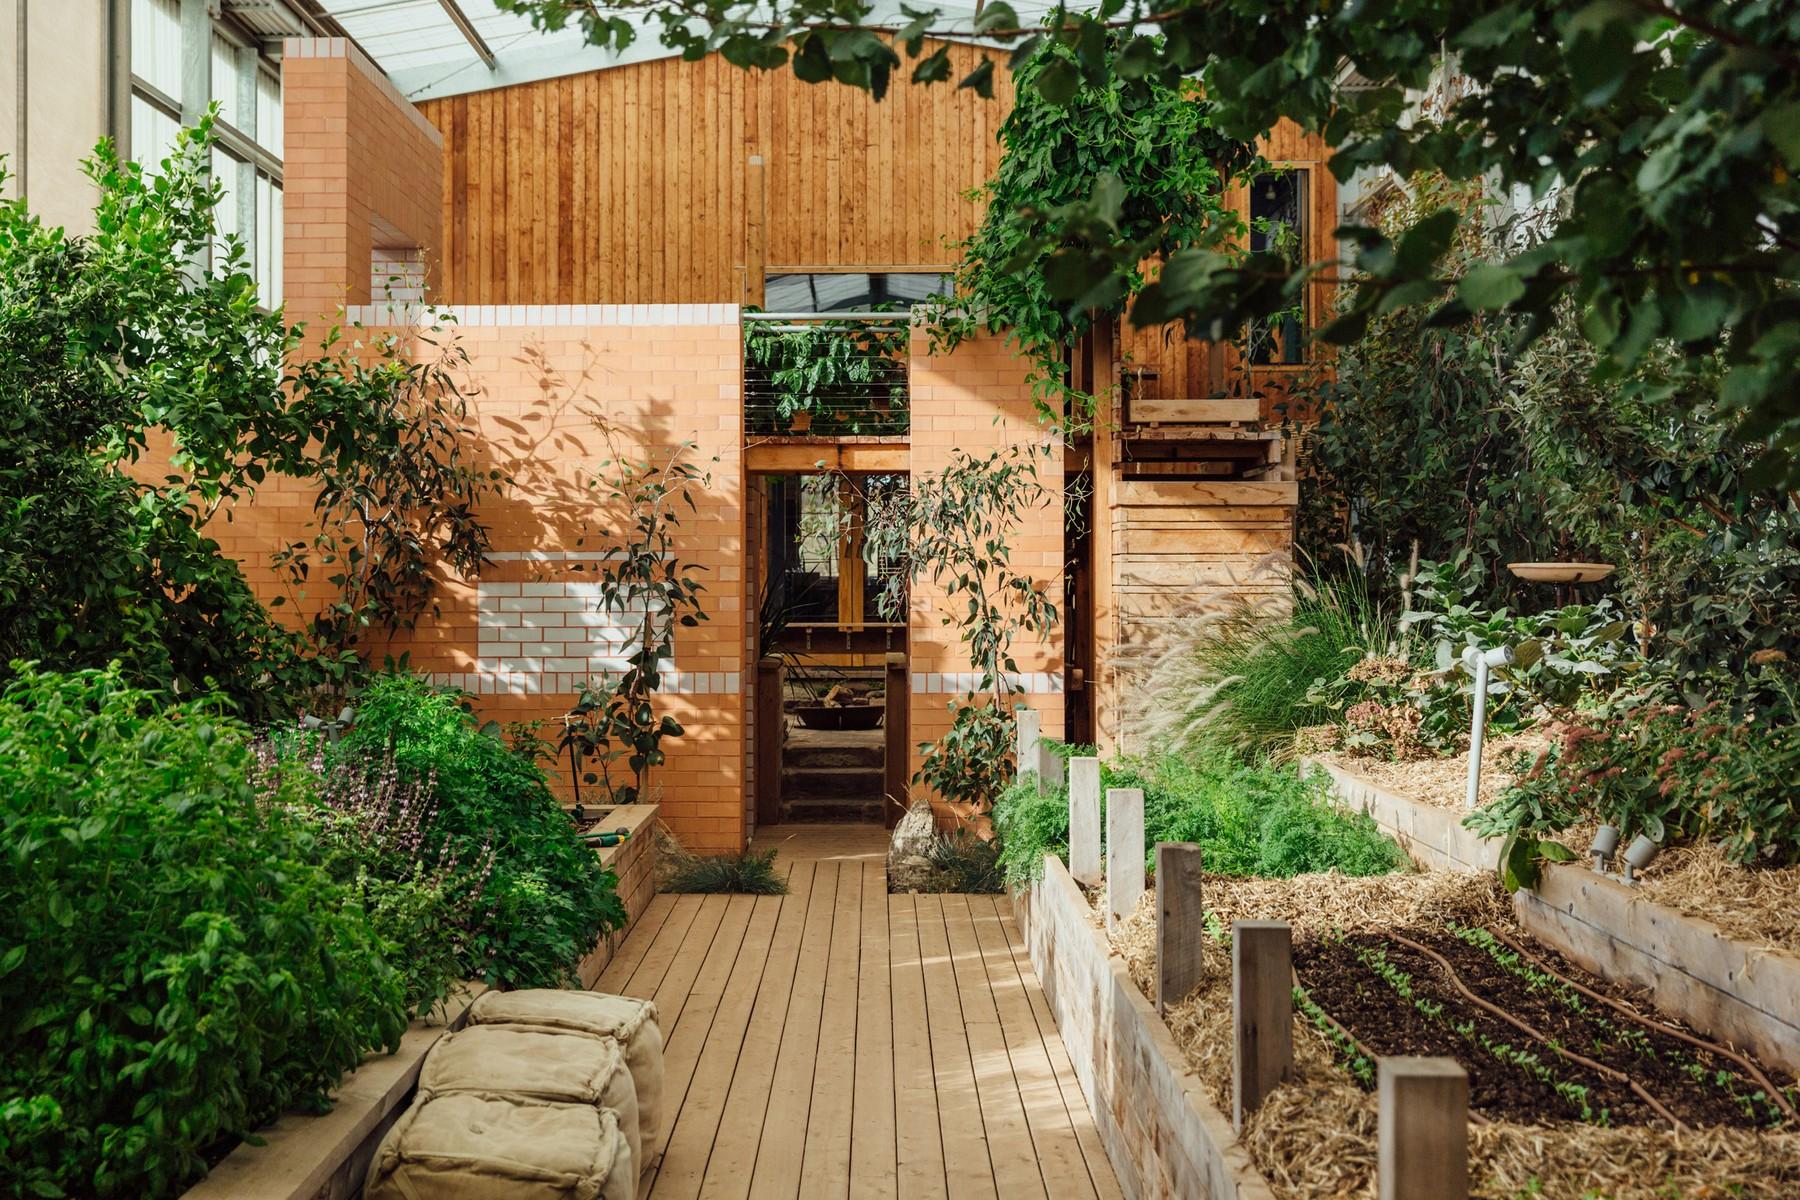 longhouse-australia-architecture-partners-hill_dezeen_2364_col_10.jpg